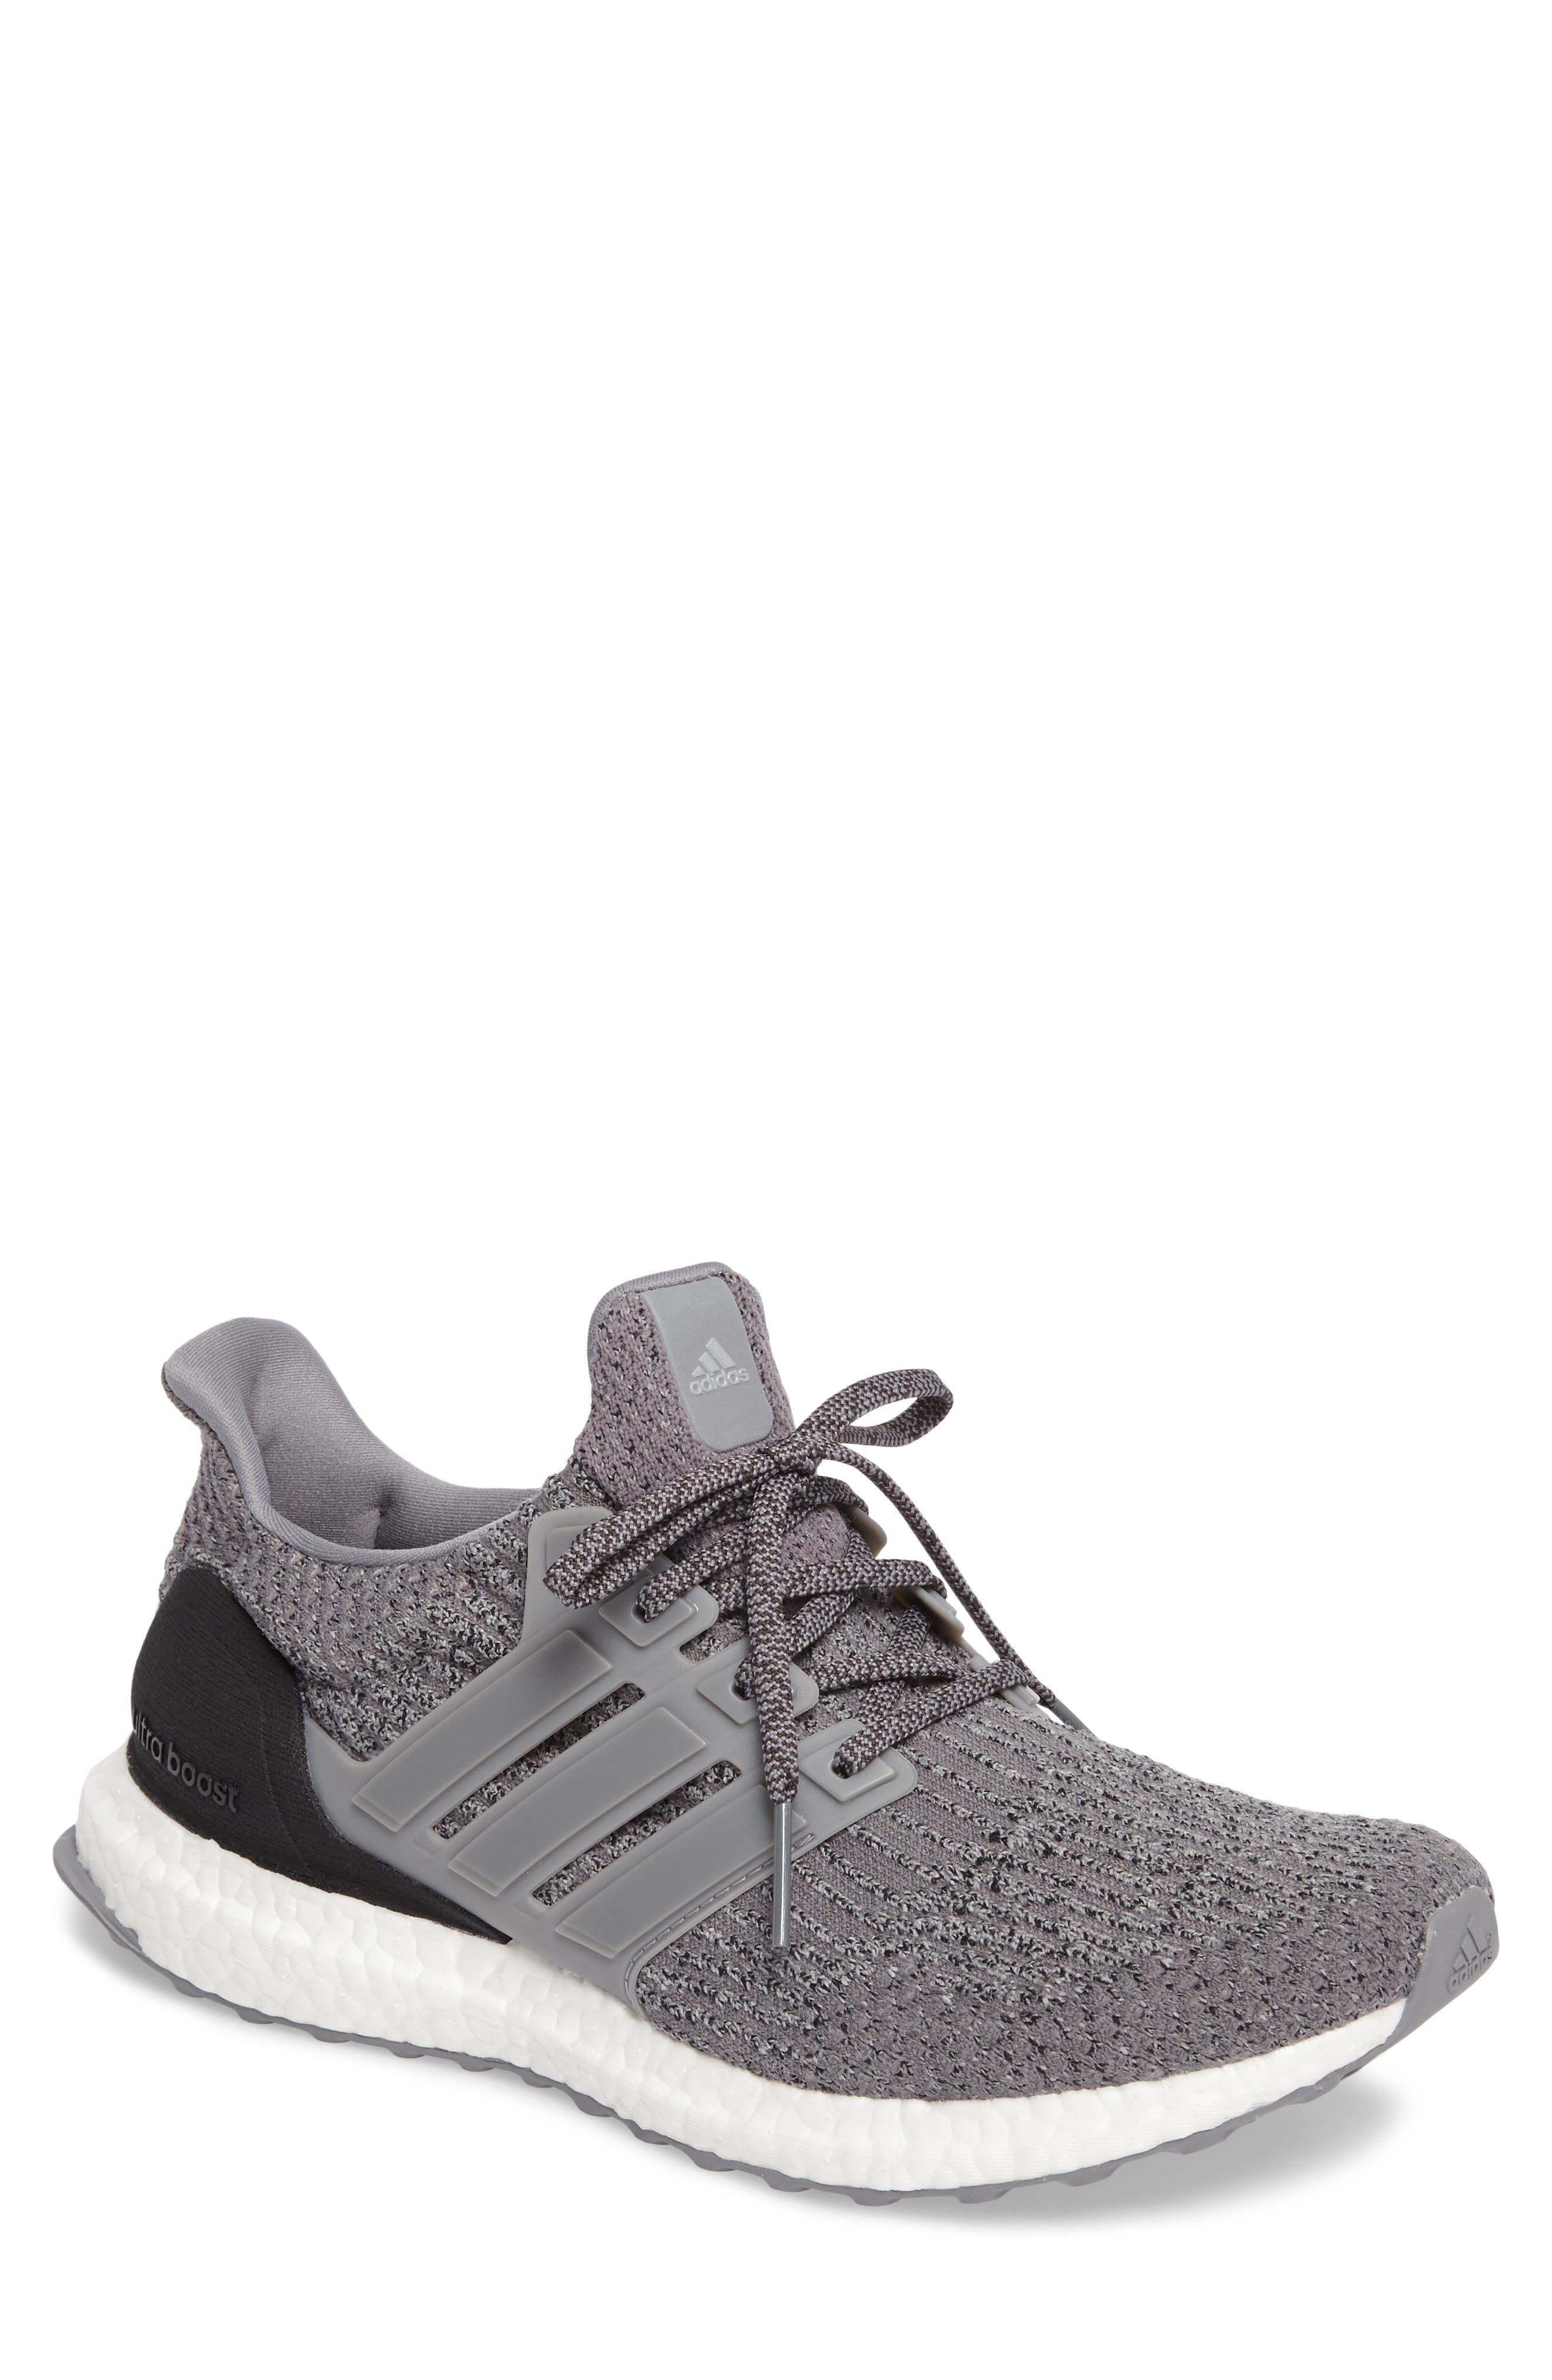 Alternate Image 1 Selected - adidas 'UltraBoost' Running Shoe (Men)